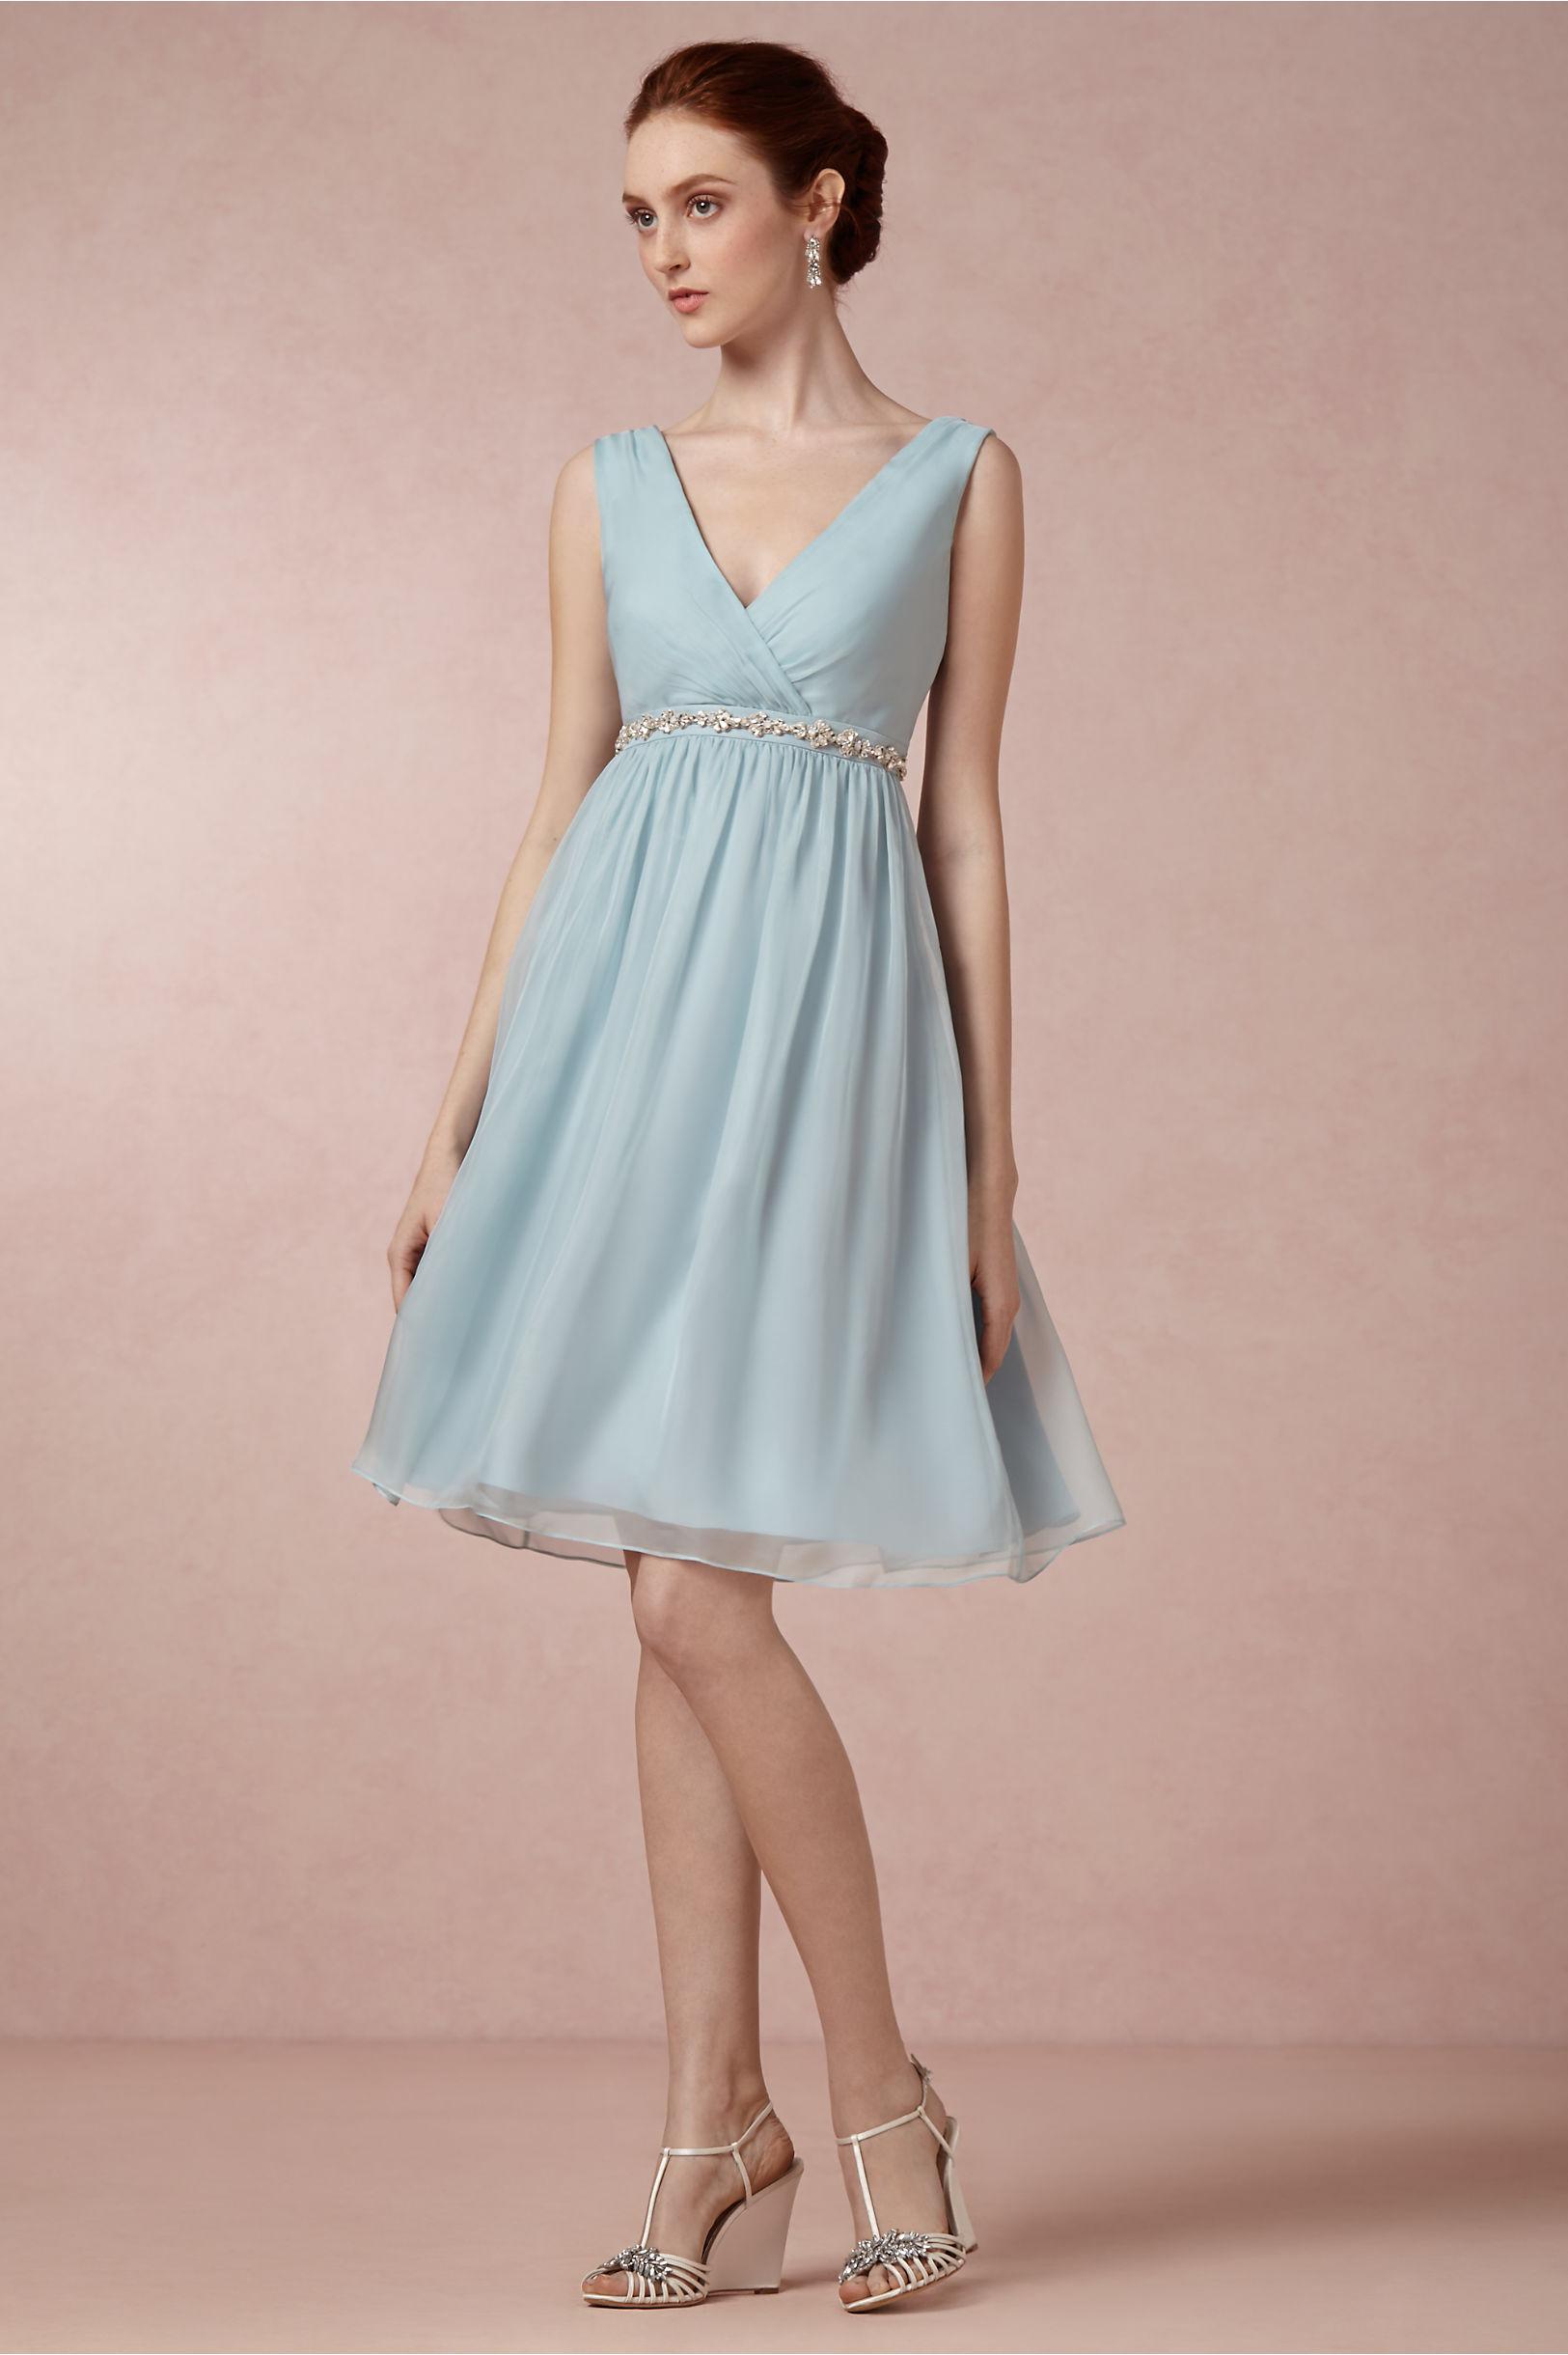 Vintage Lace Detail Knee Length Chiffon Bridesmaid Dress